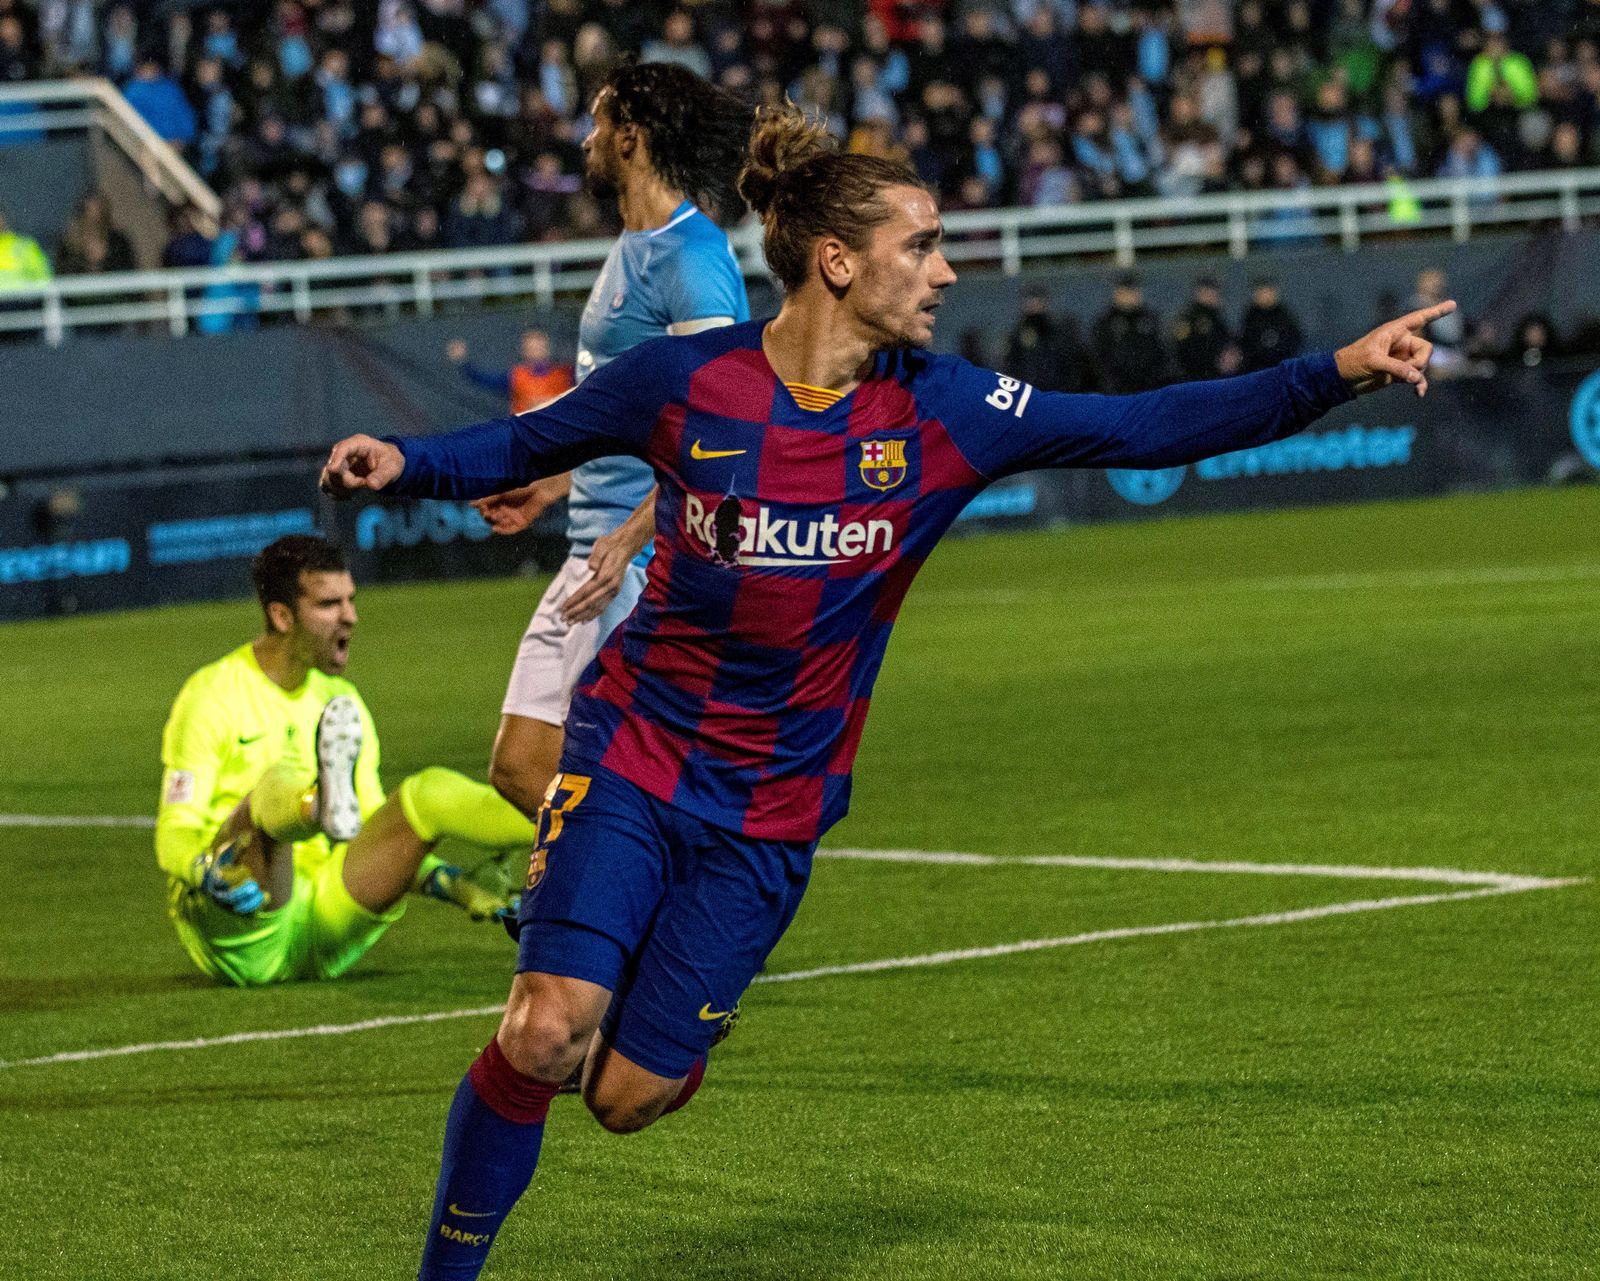 UD Ibiza - FC Barcelona, Spain - 22 Jan 2020